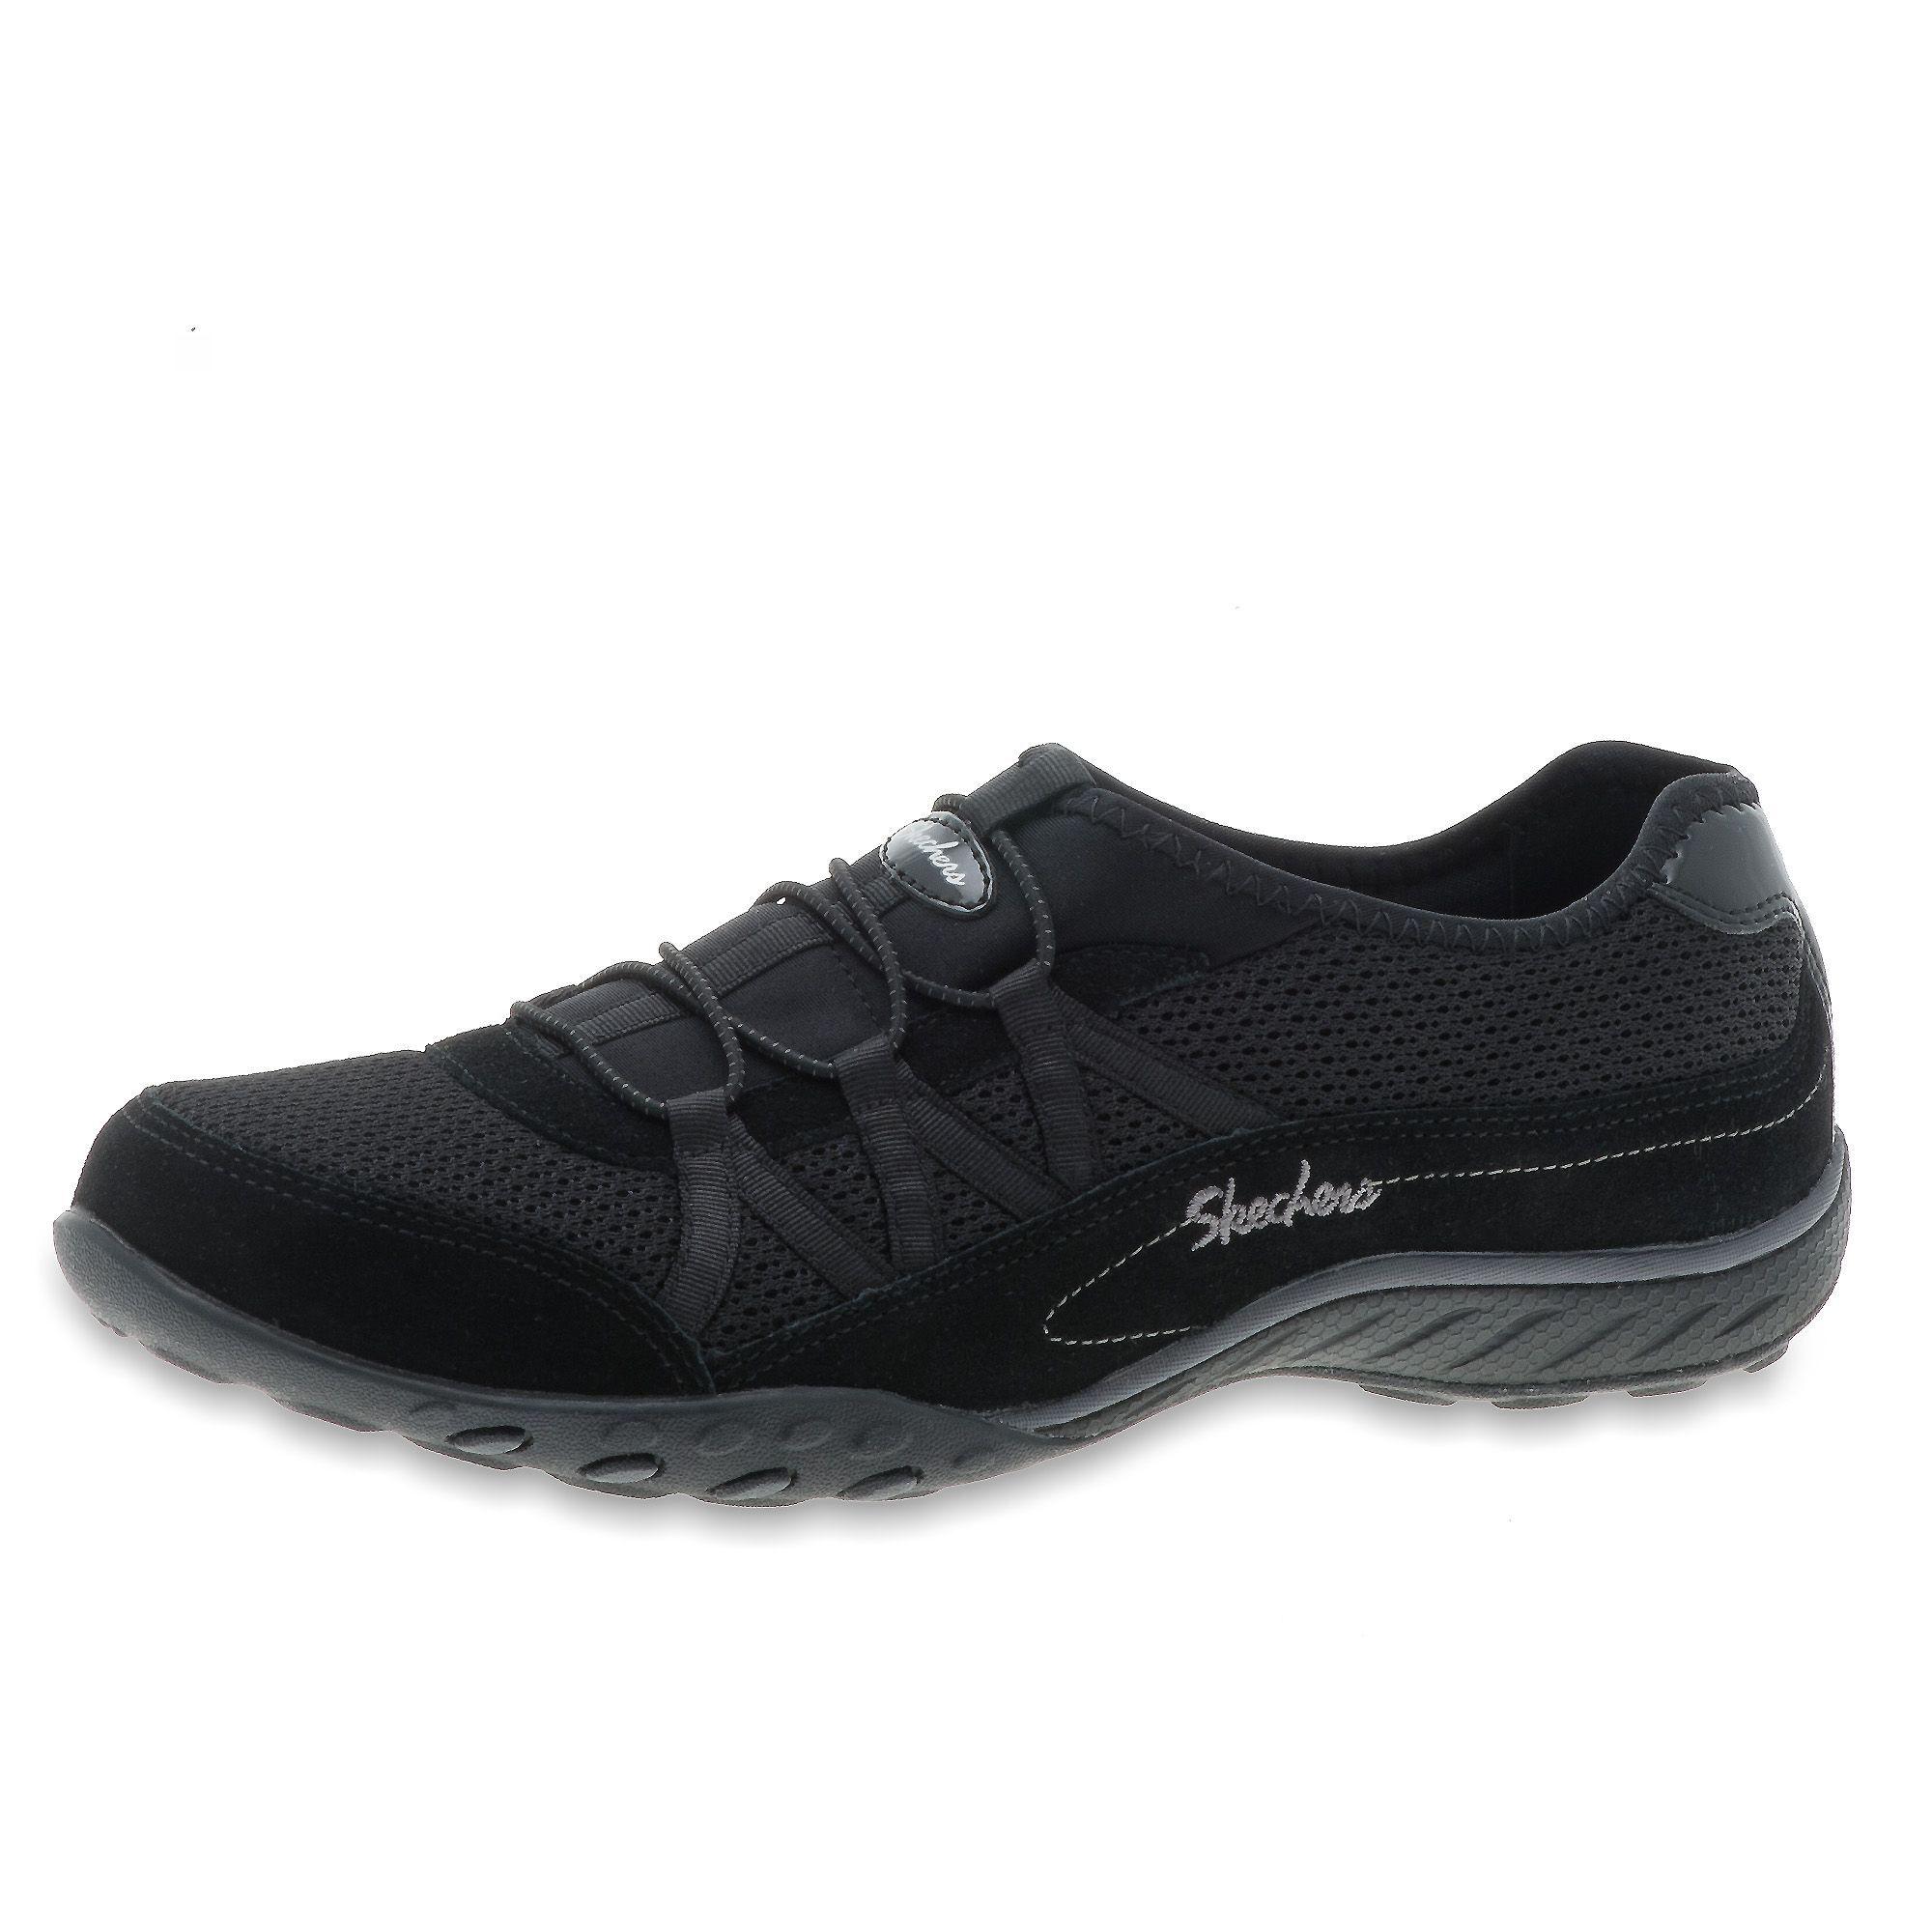 skechers scarpa fitness relaxed fit con inserti elastici e soletta in memory foam